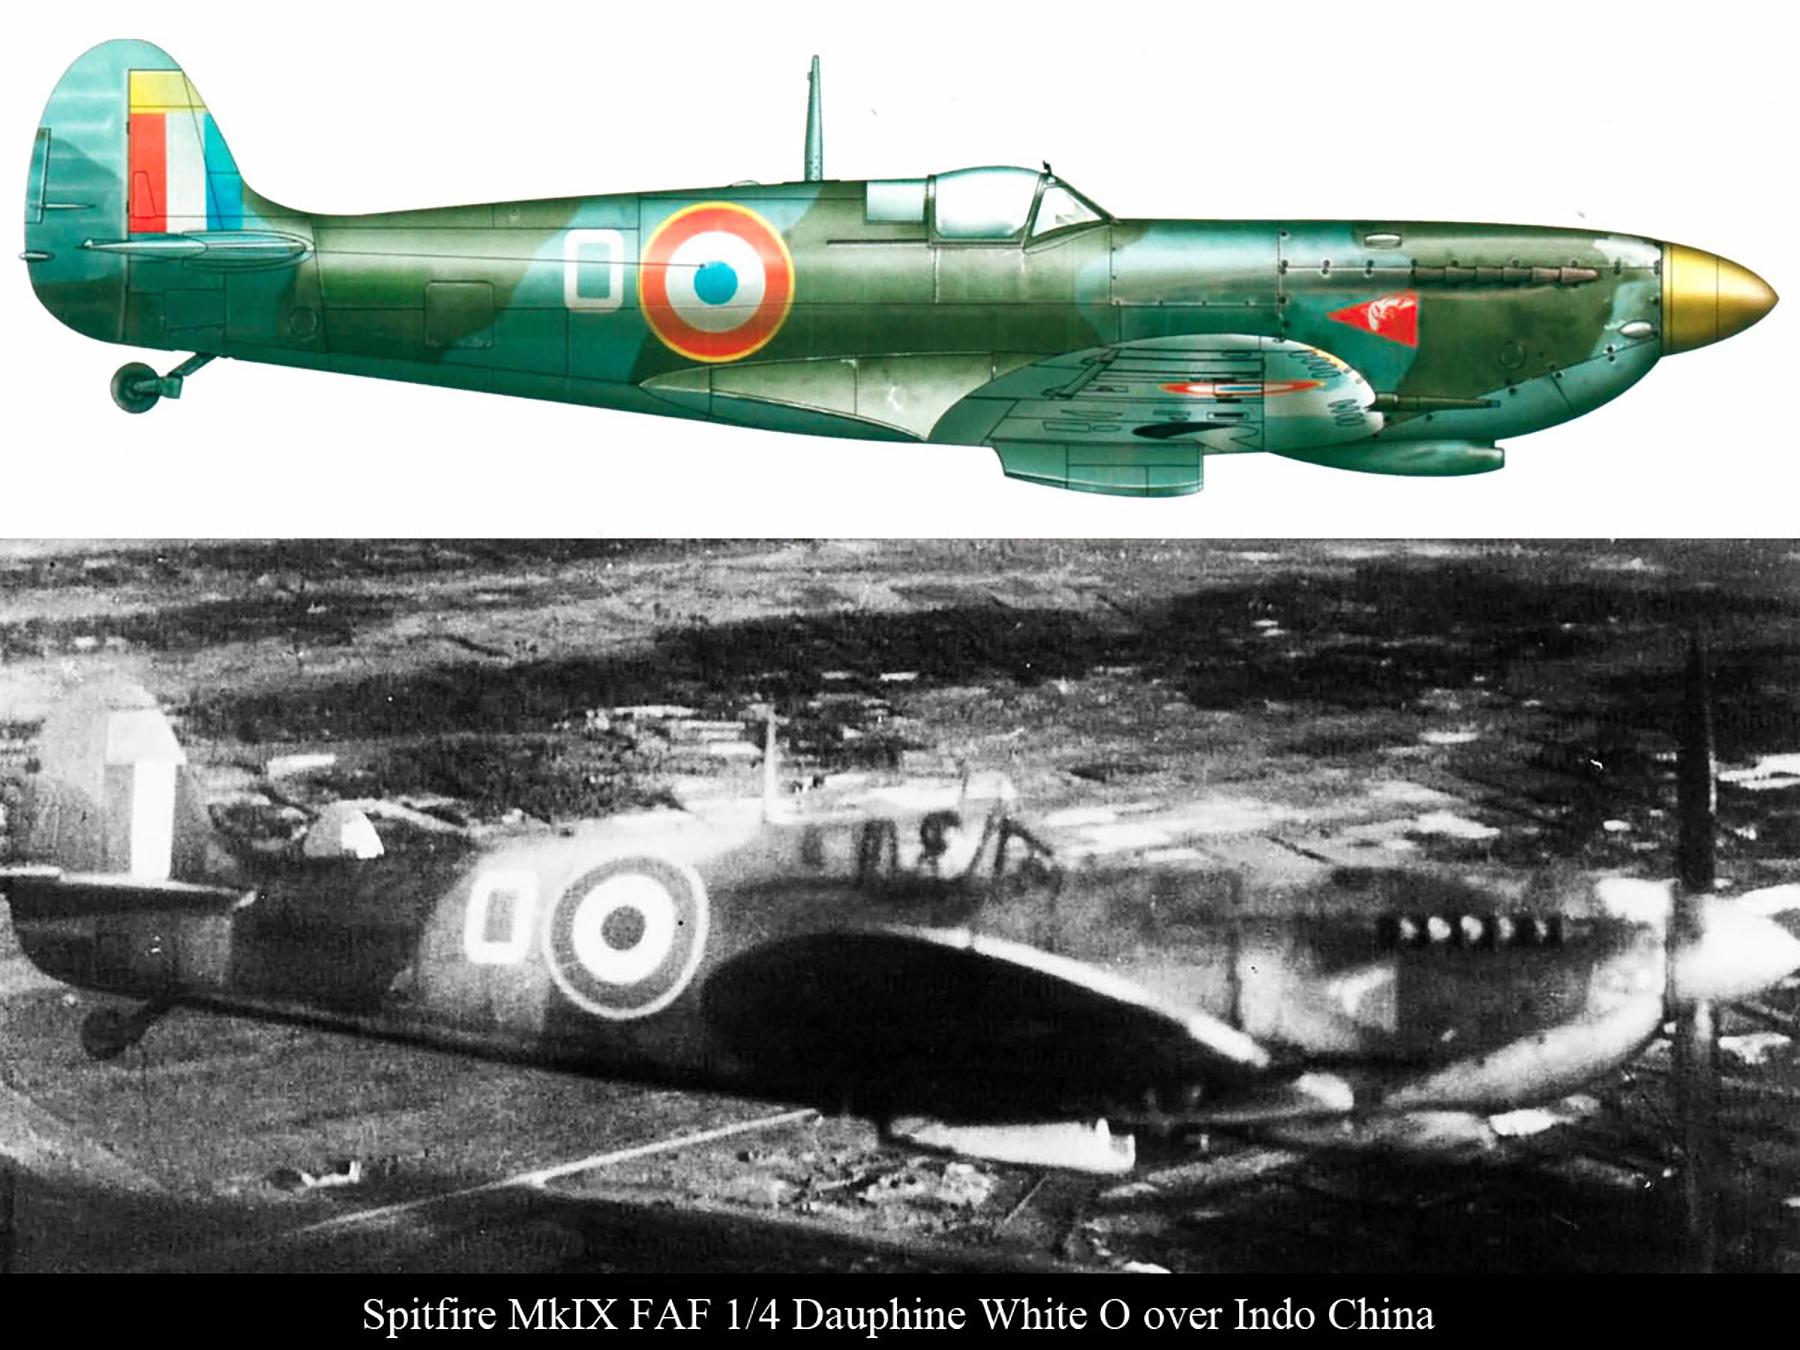 Spitfire MkIX FAF 1.4 Dauphine White O over Indo China 01